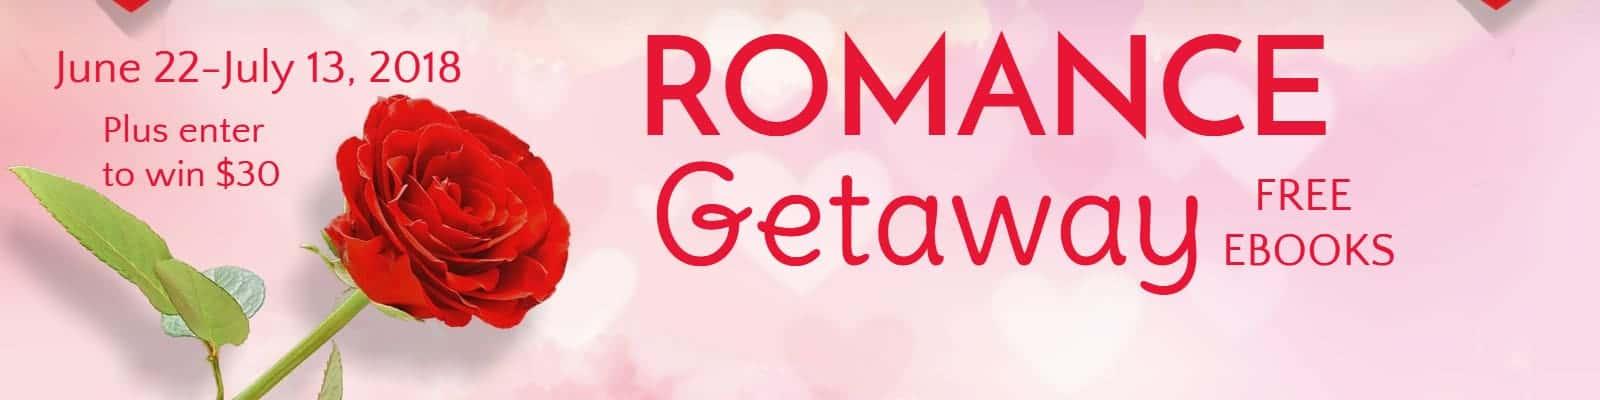 Romance Getaway